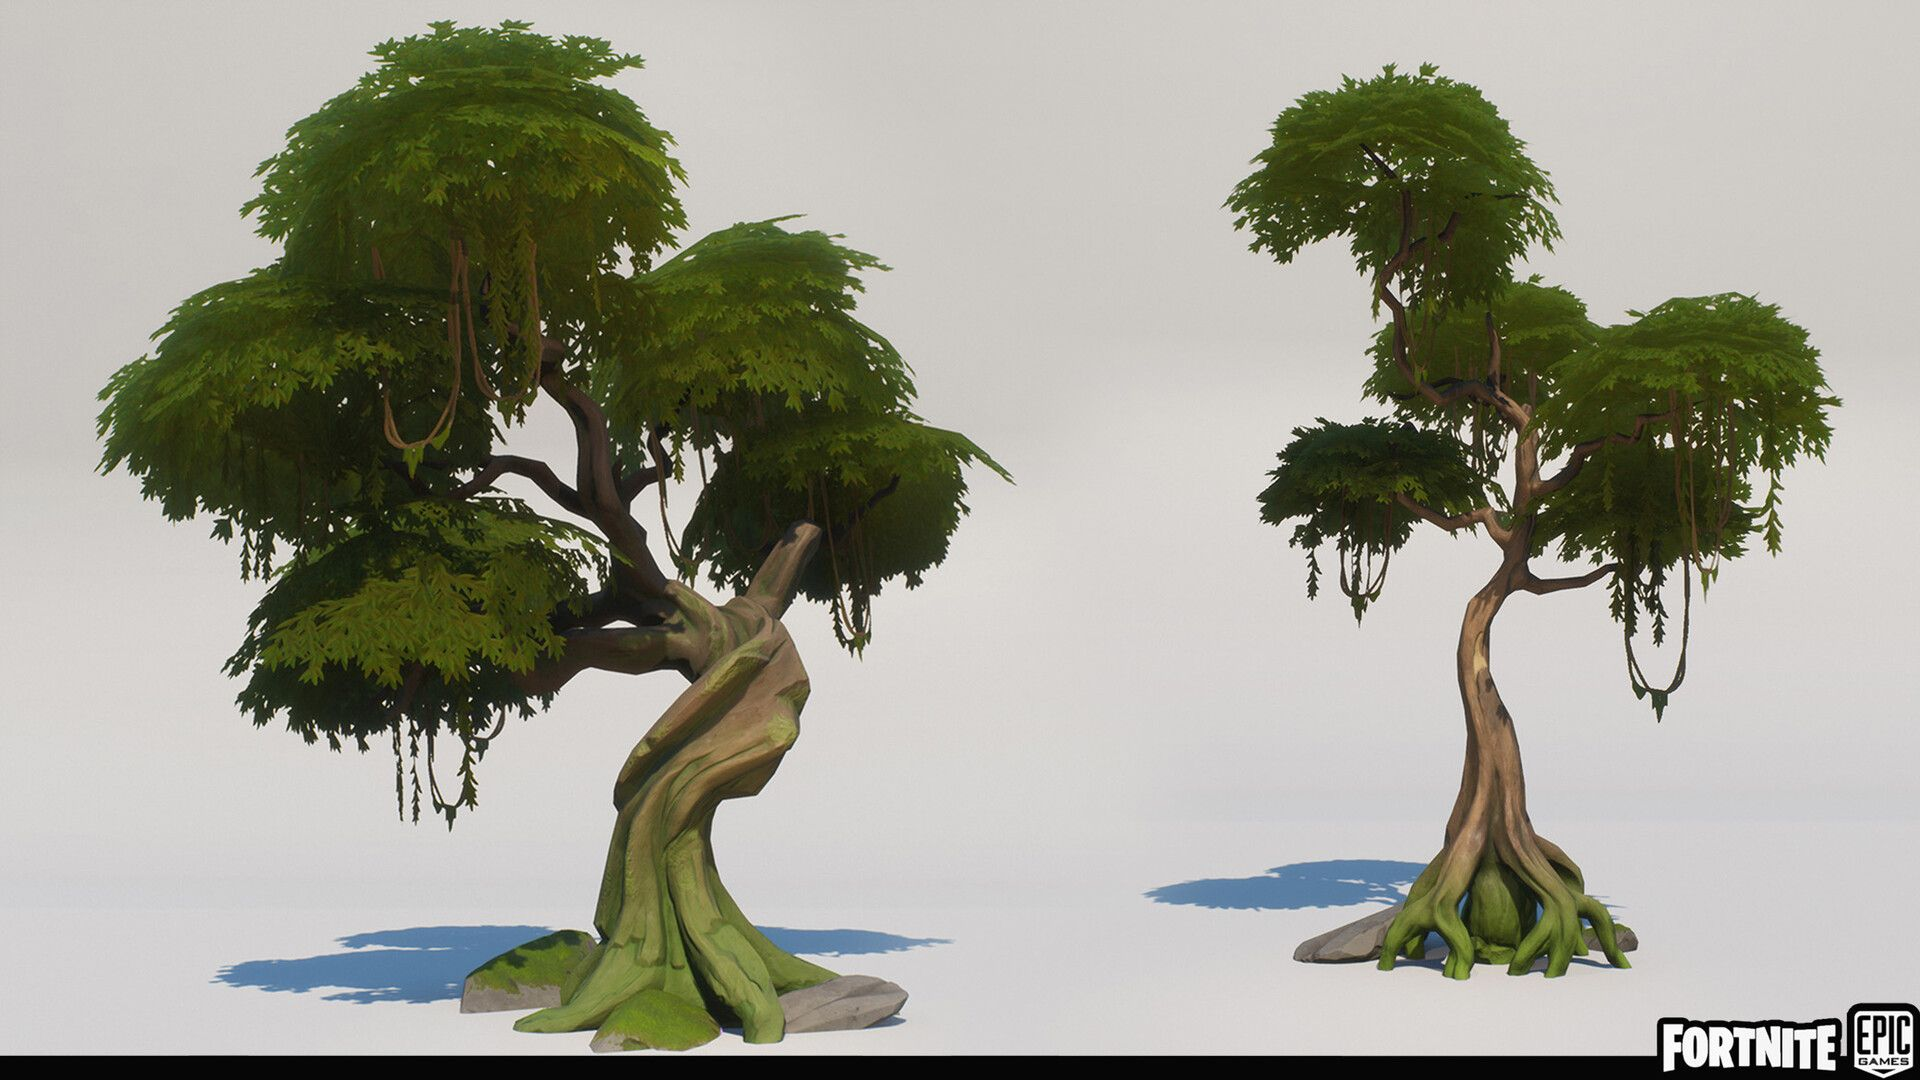 Pin By Marti On Jax 9th Birthday Environment Concept Art Environmental Art Cartoon Trees